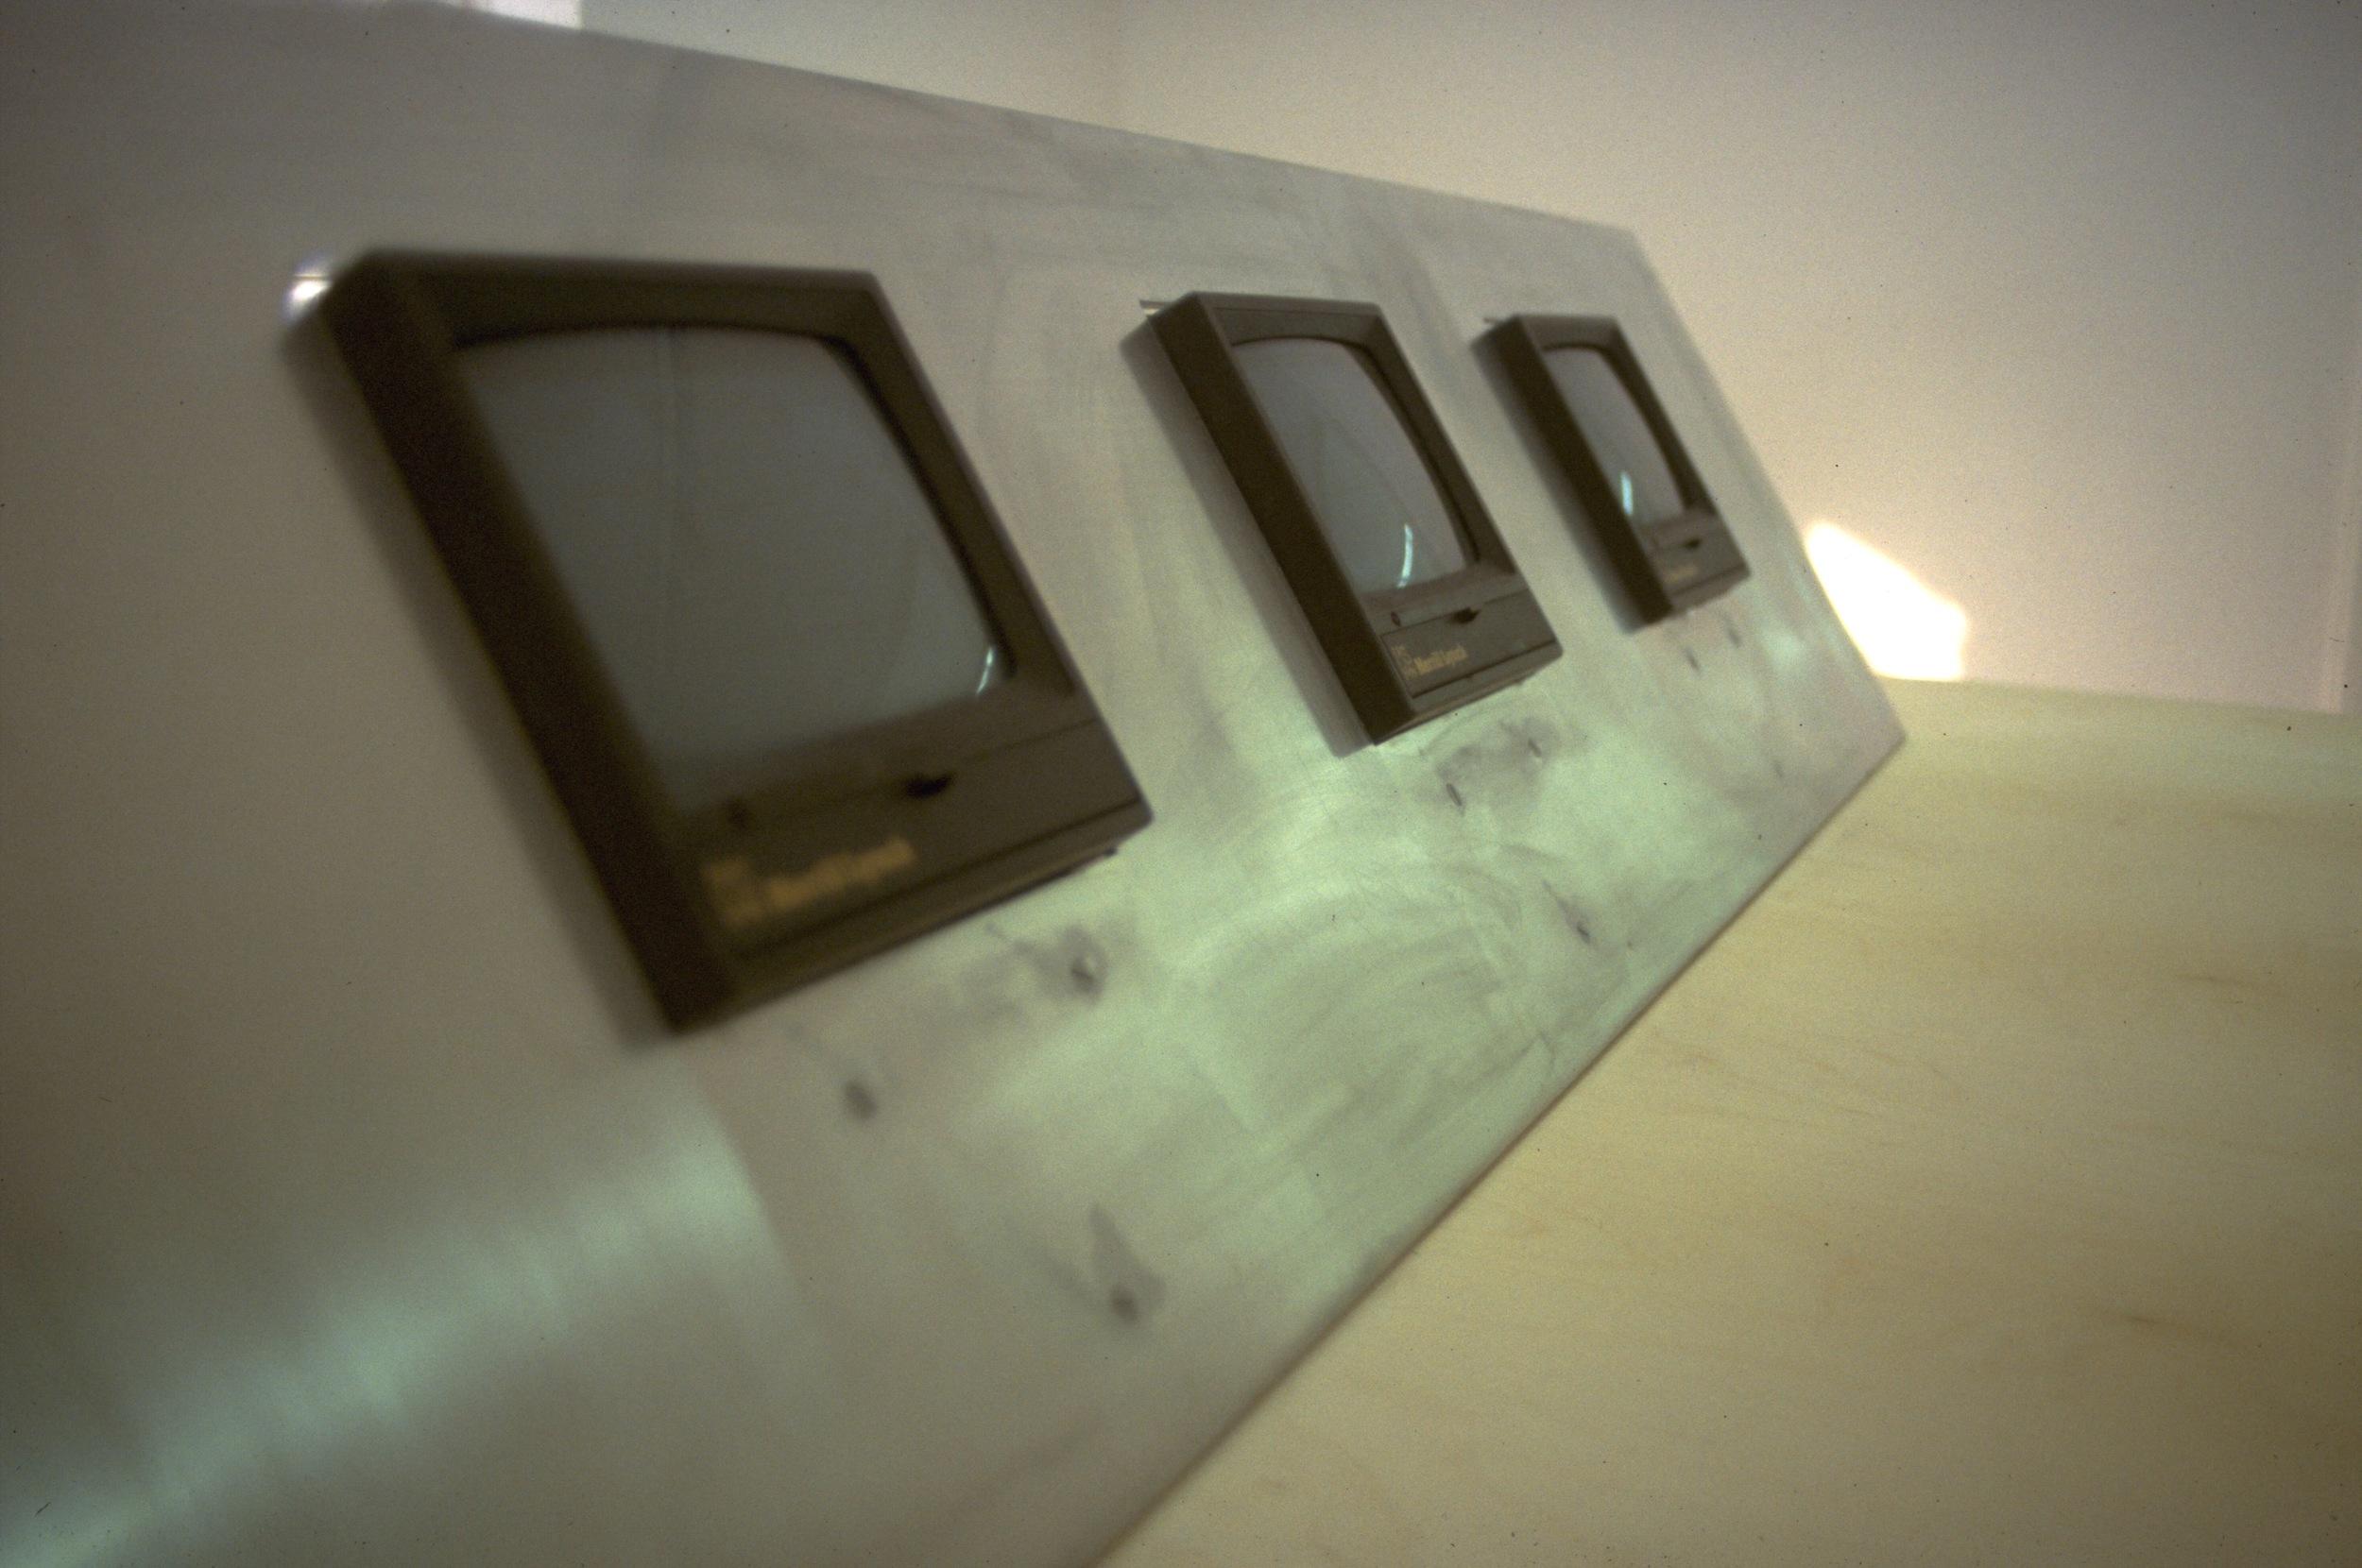 GUNTHER_Ingo_Video_Installations-53.jpg